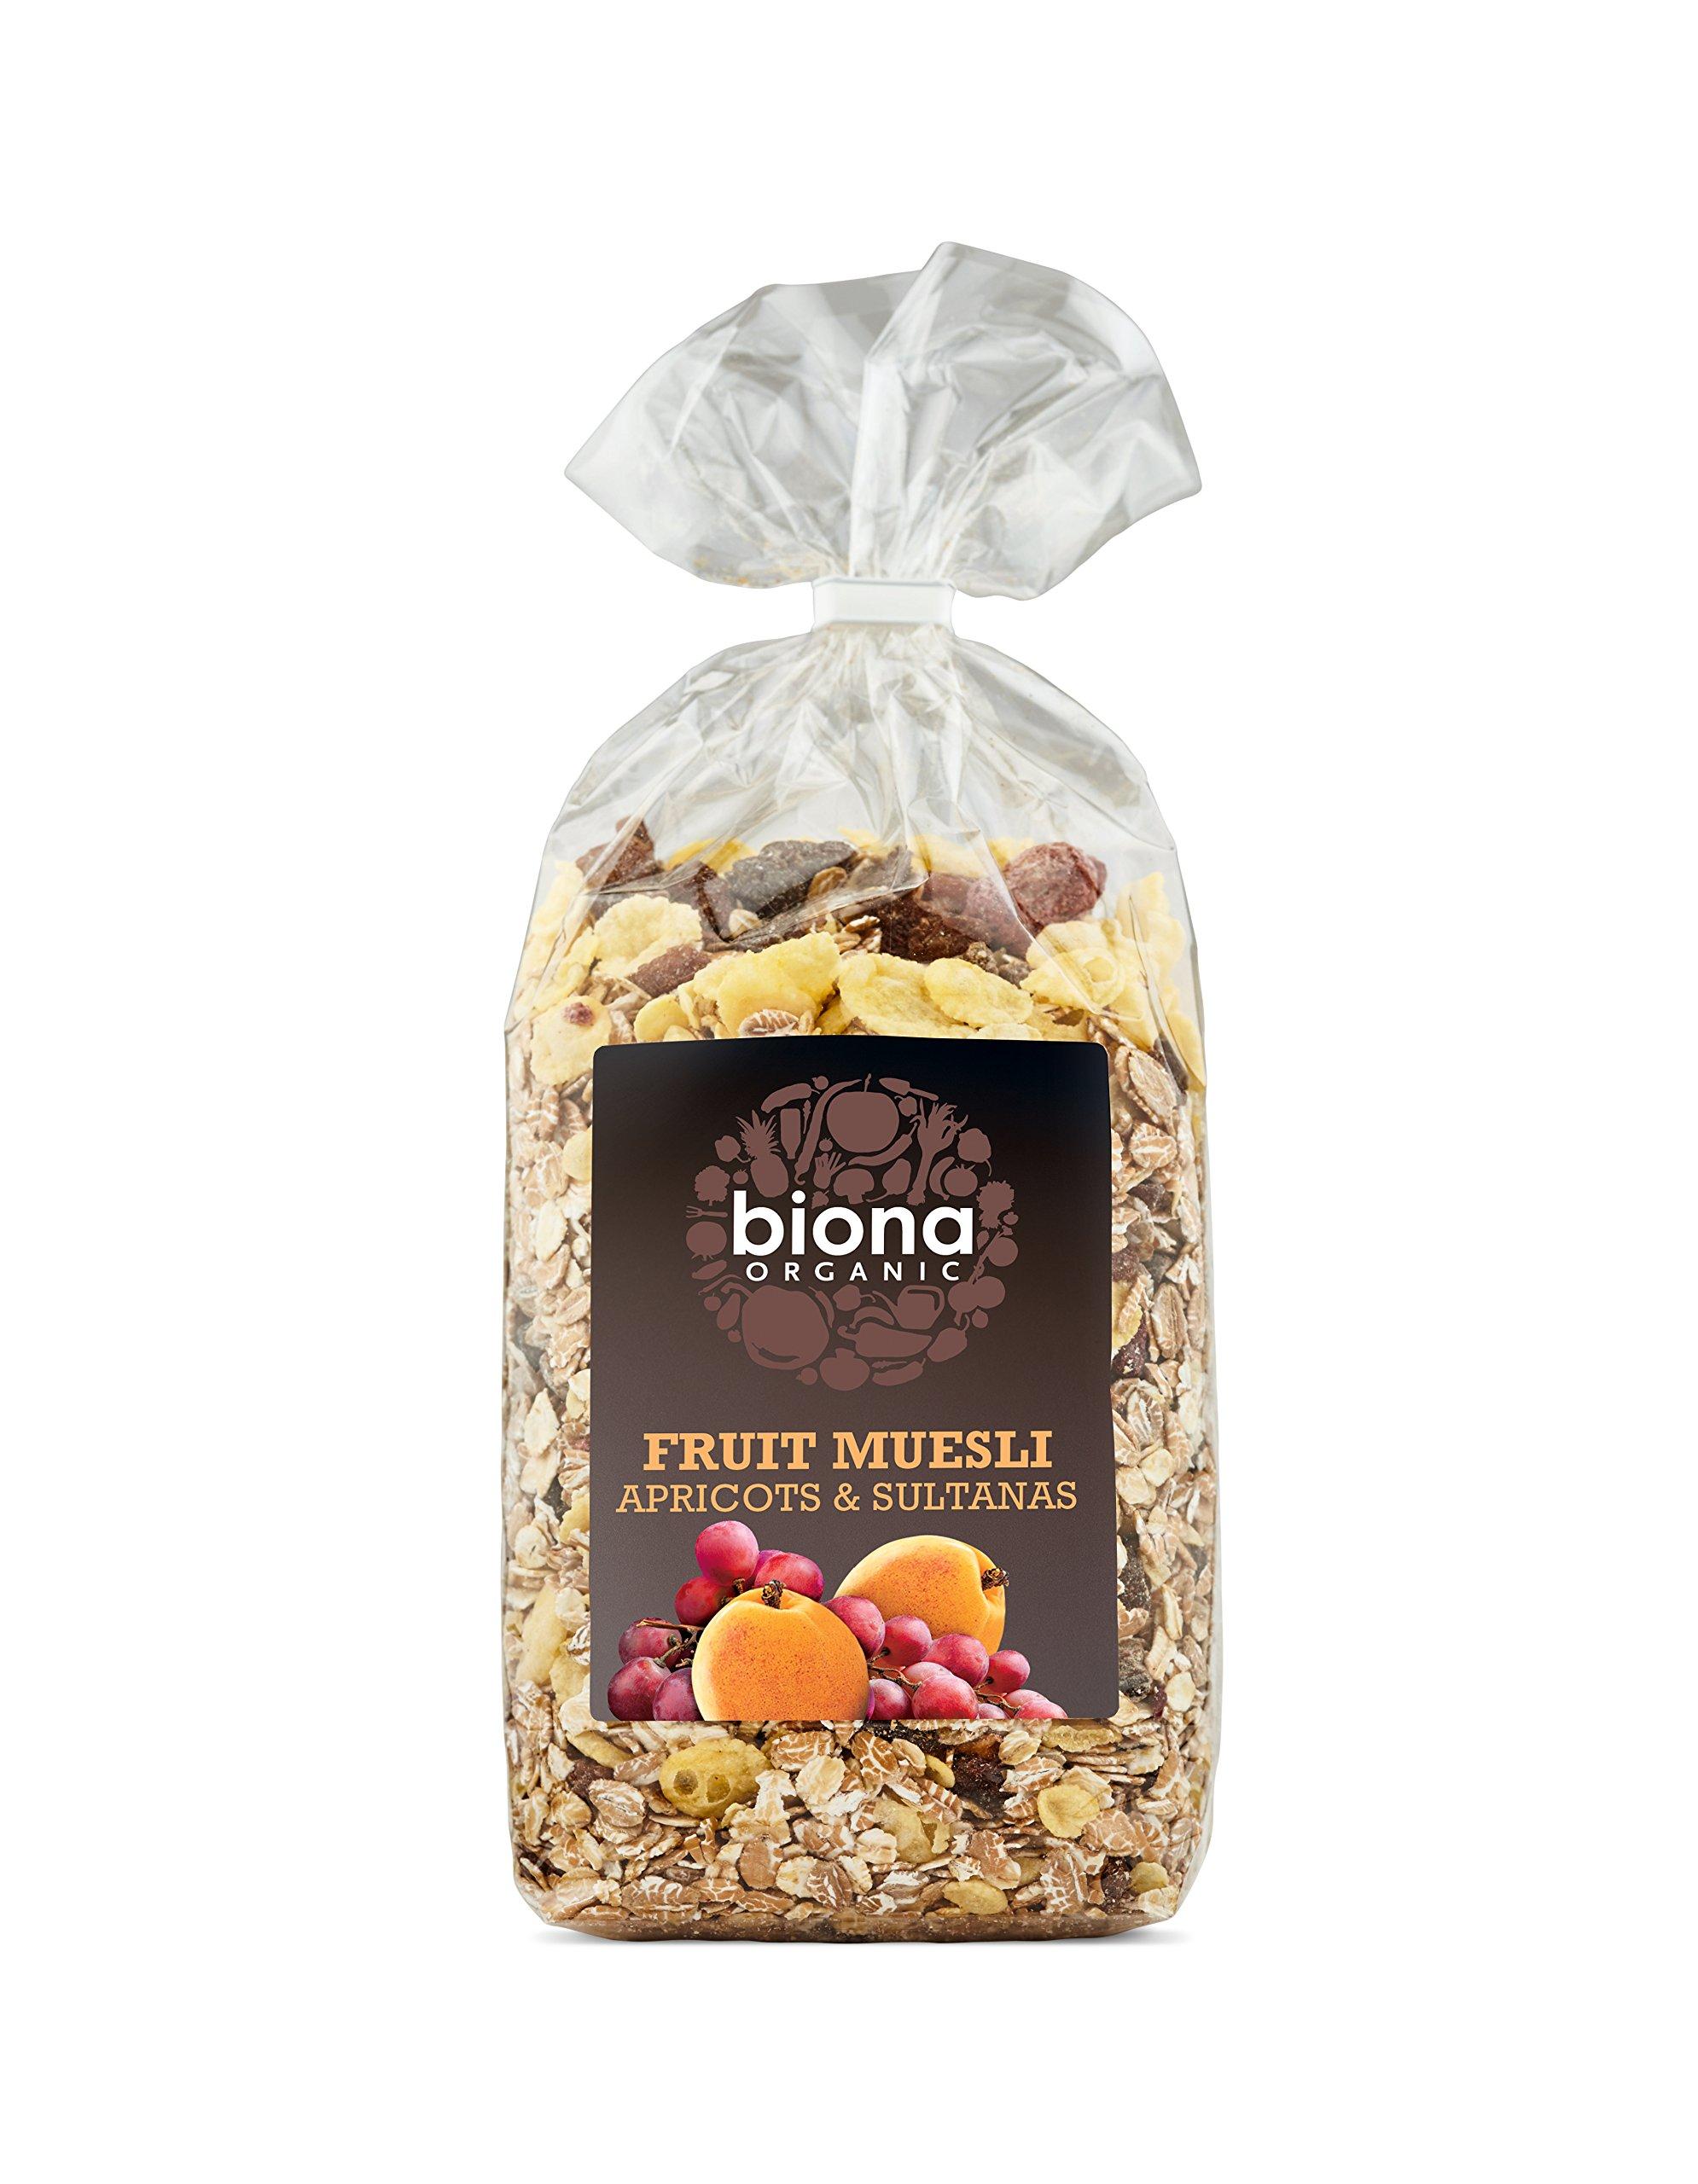 Biona Organic Apricot and Sultana Muesli 500 g (Pack of 3)